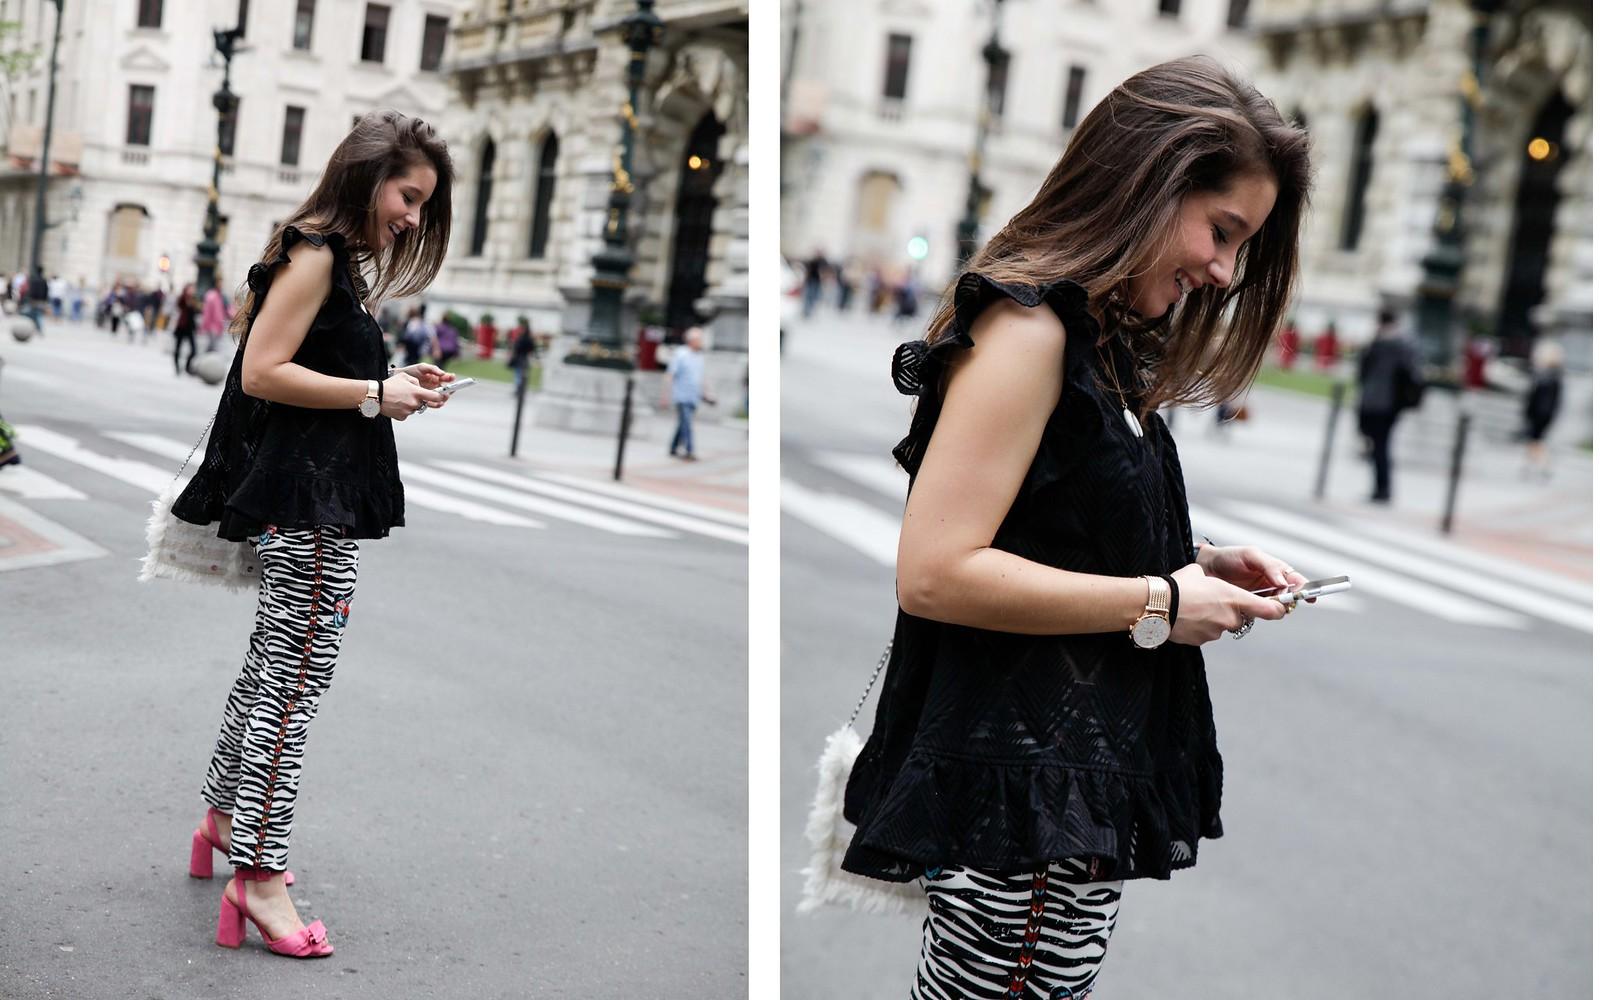 05_Pantalones_Zebra_Blusa_Boho_tacones_rosas_stradivarius_Theguestgirl_outfit_barcelona_streetstyle